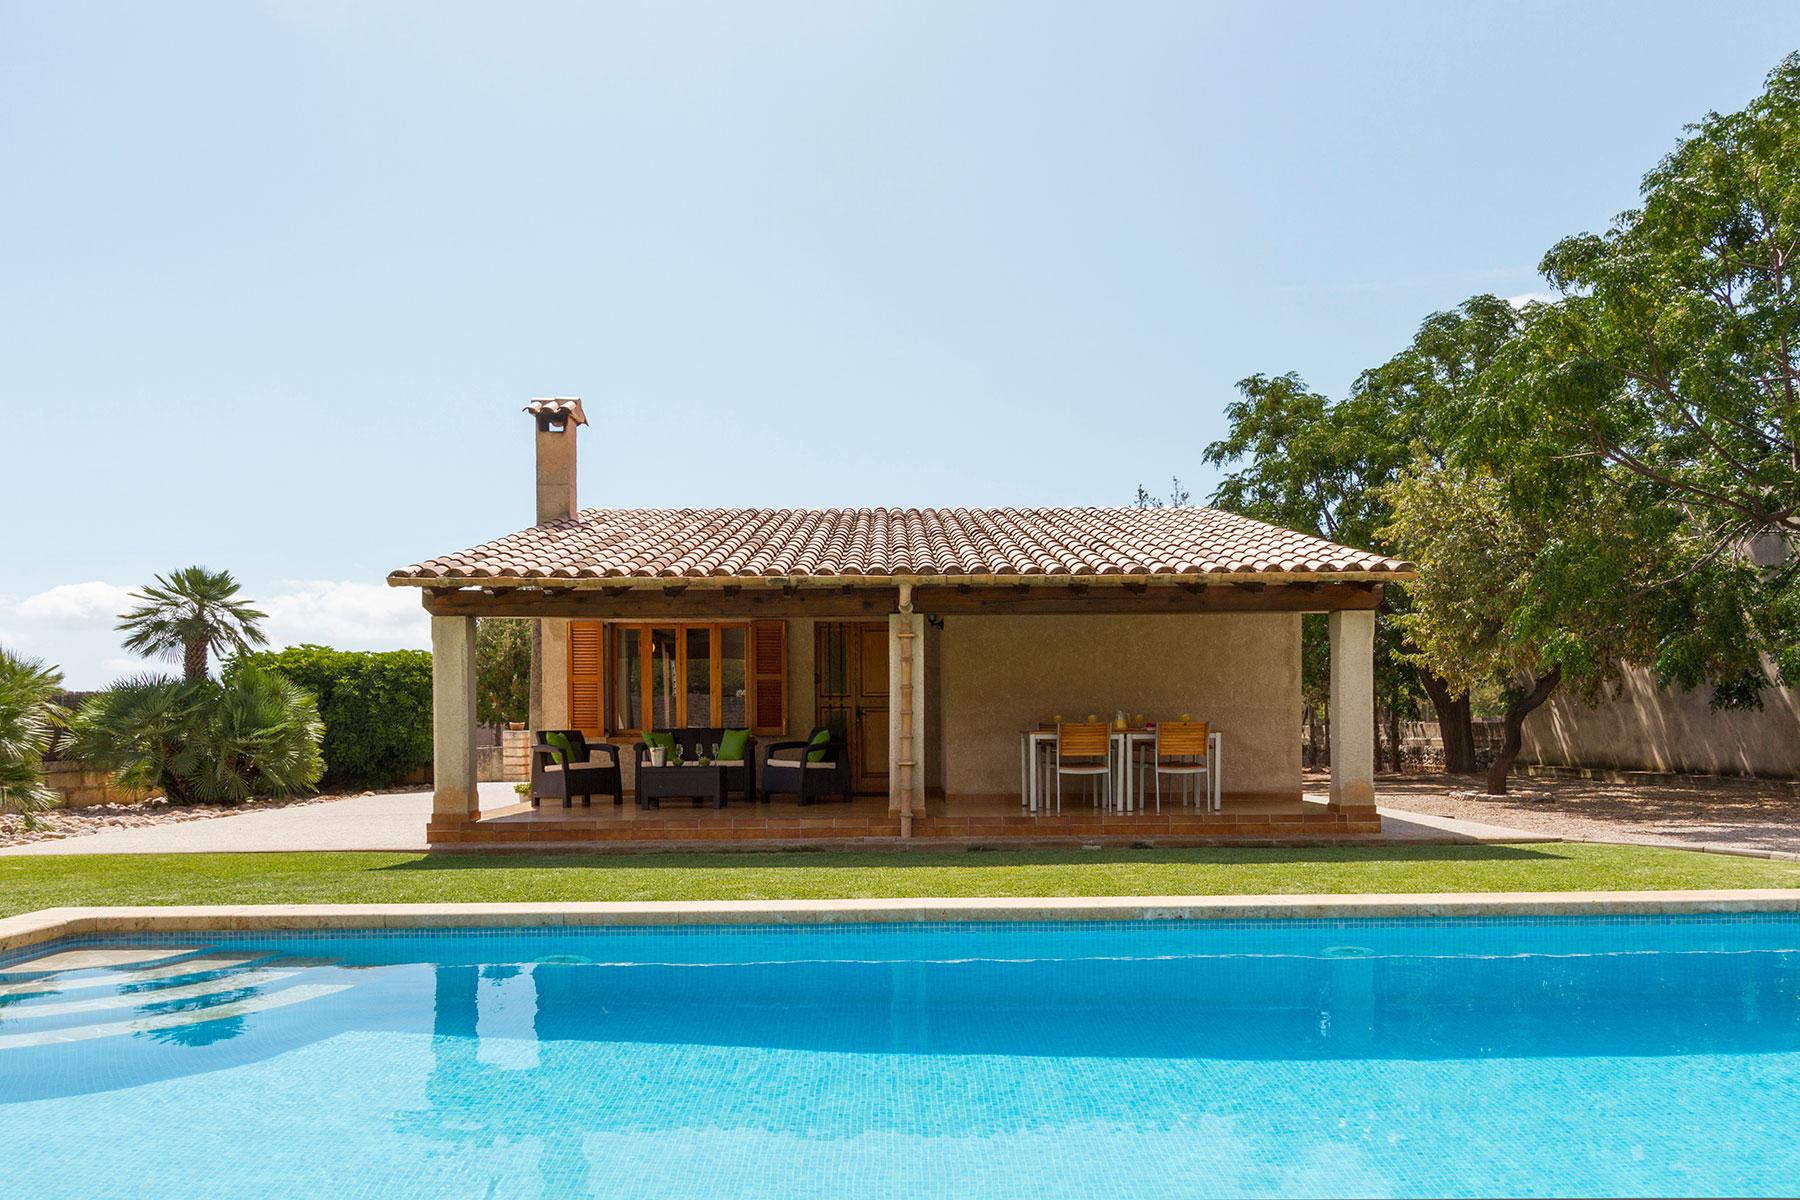 Finca lauta auf mallorca mieten finca ferienhaus - Formentera ferienhaus mit pool ...